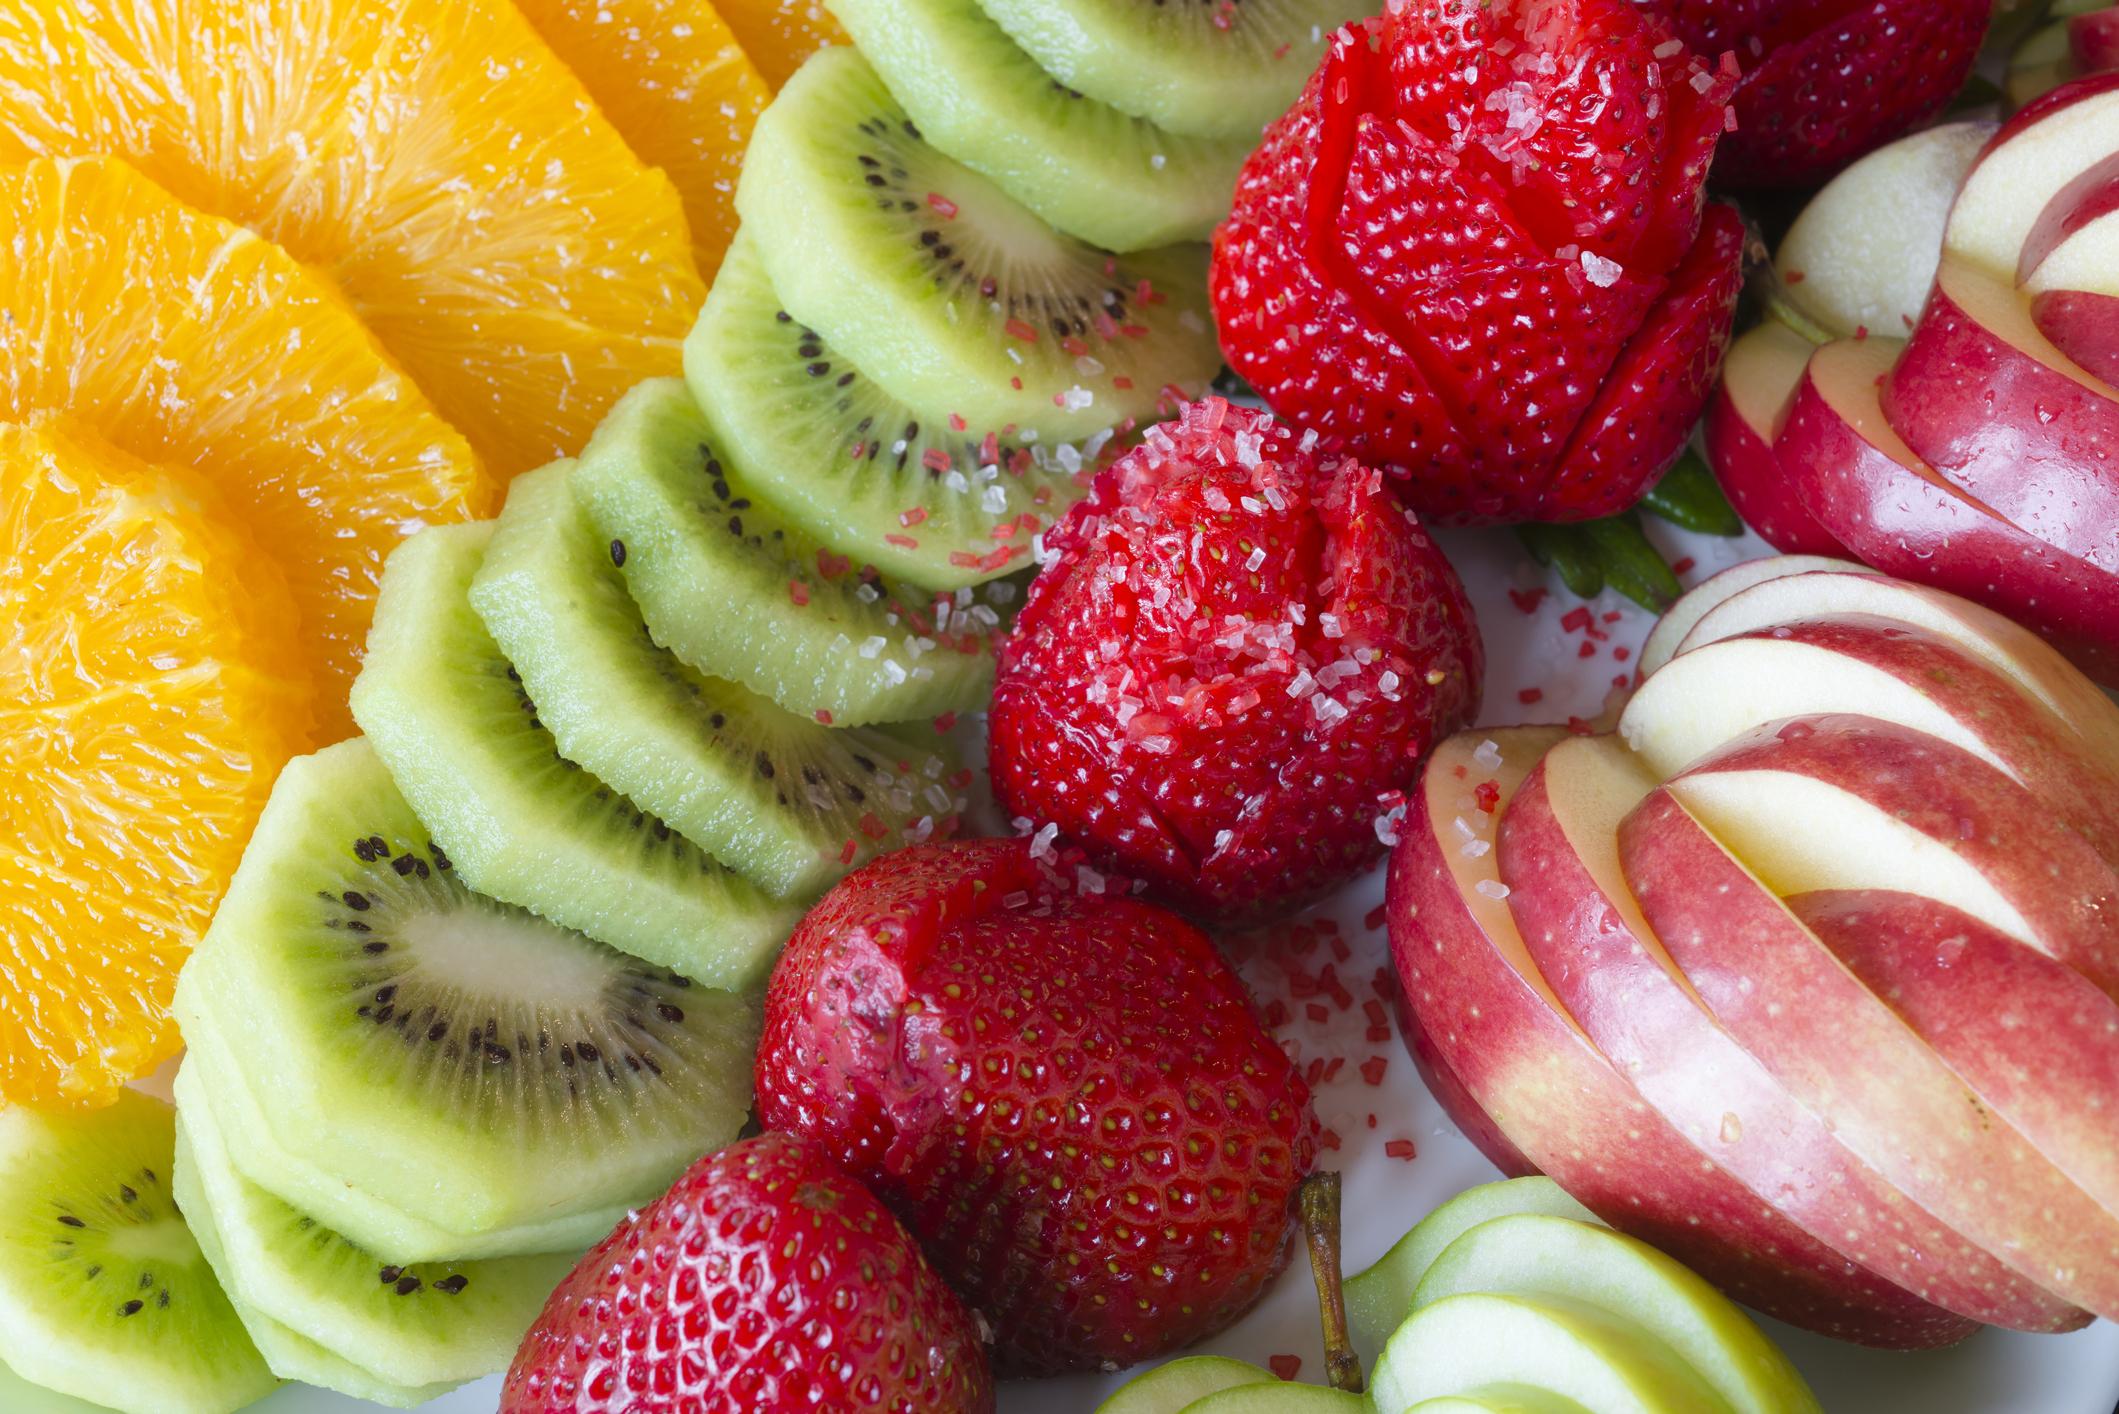 Pack along sliced fruit! (Image source: iStock)